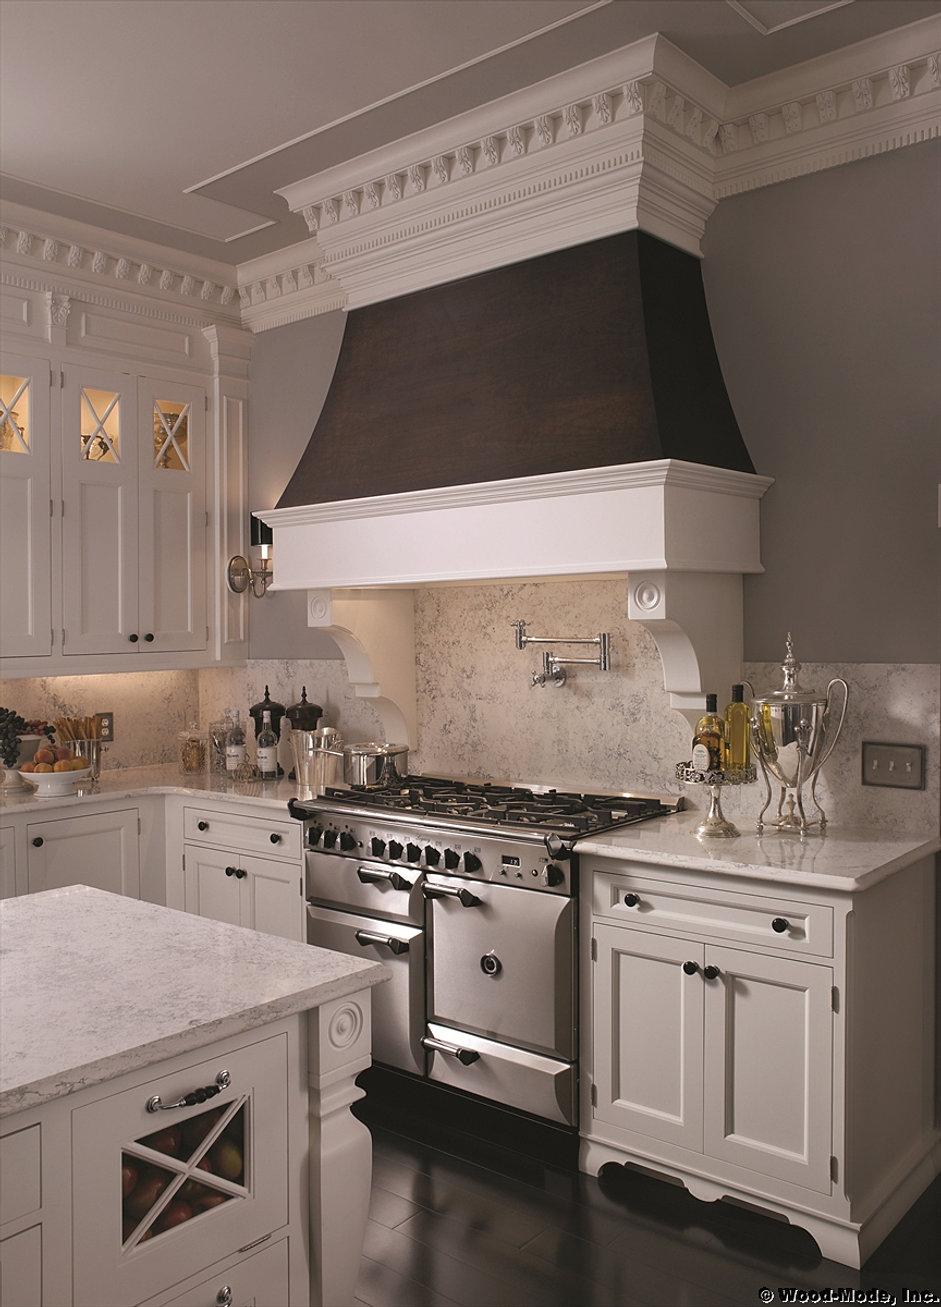 Country Kitchen Vero Beach Cabinet Design In Vero Beach Florida Home